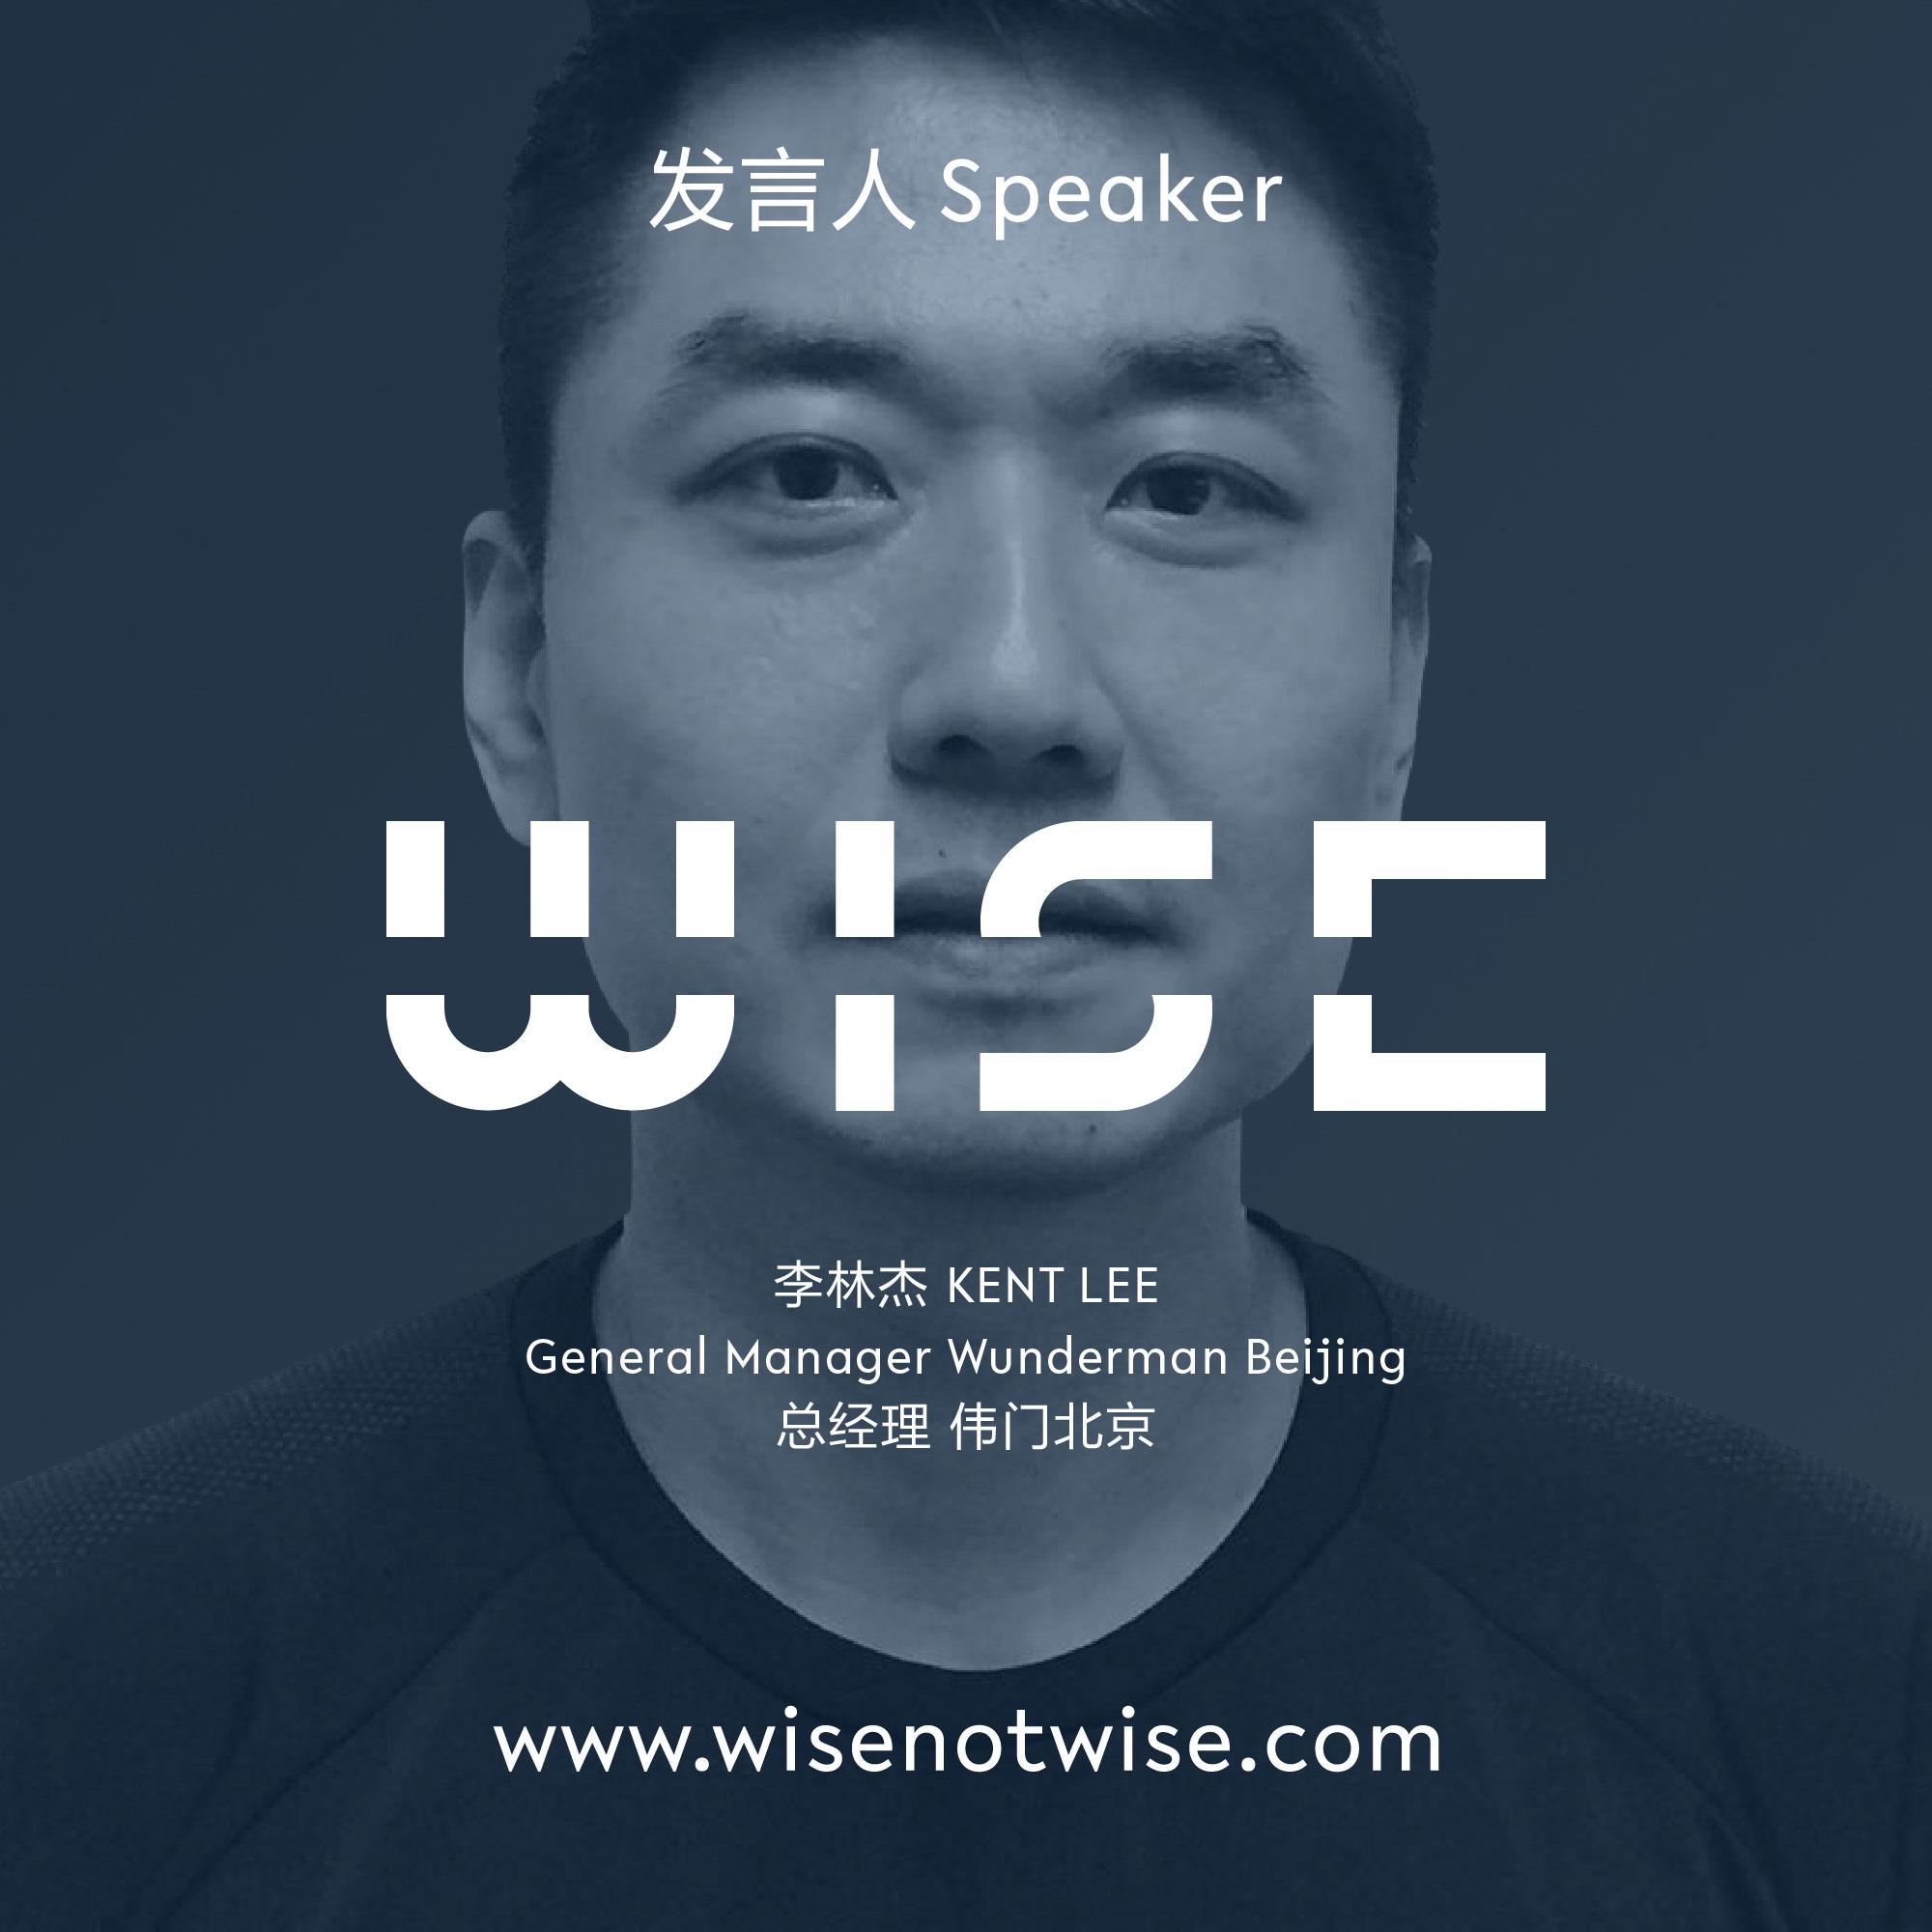 Kent Lee (General Manager of Wunderman Beijing)